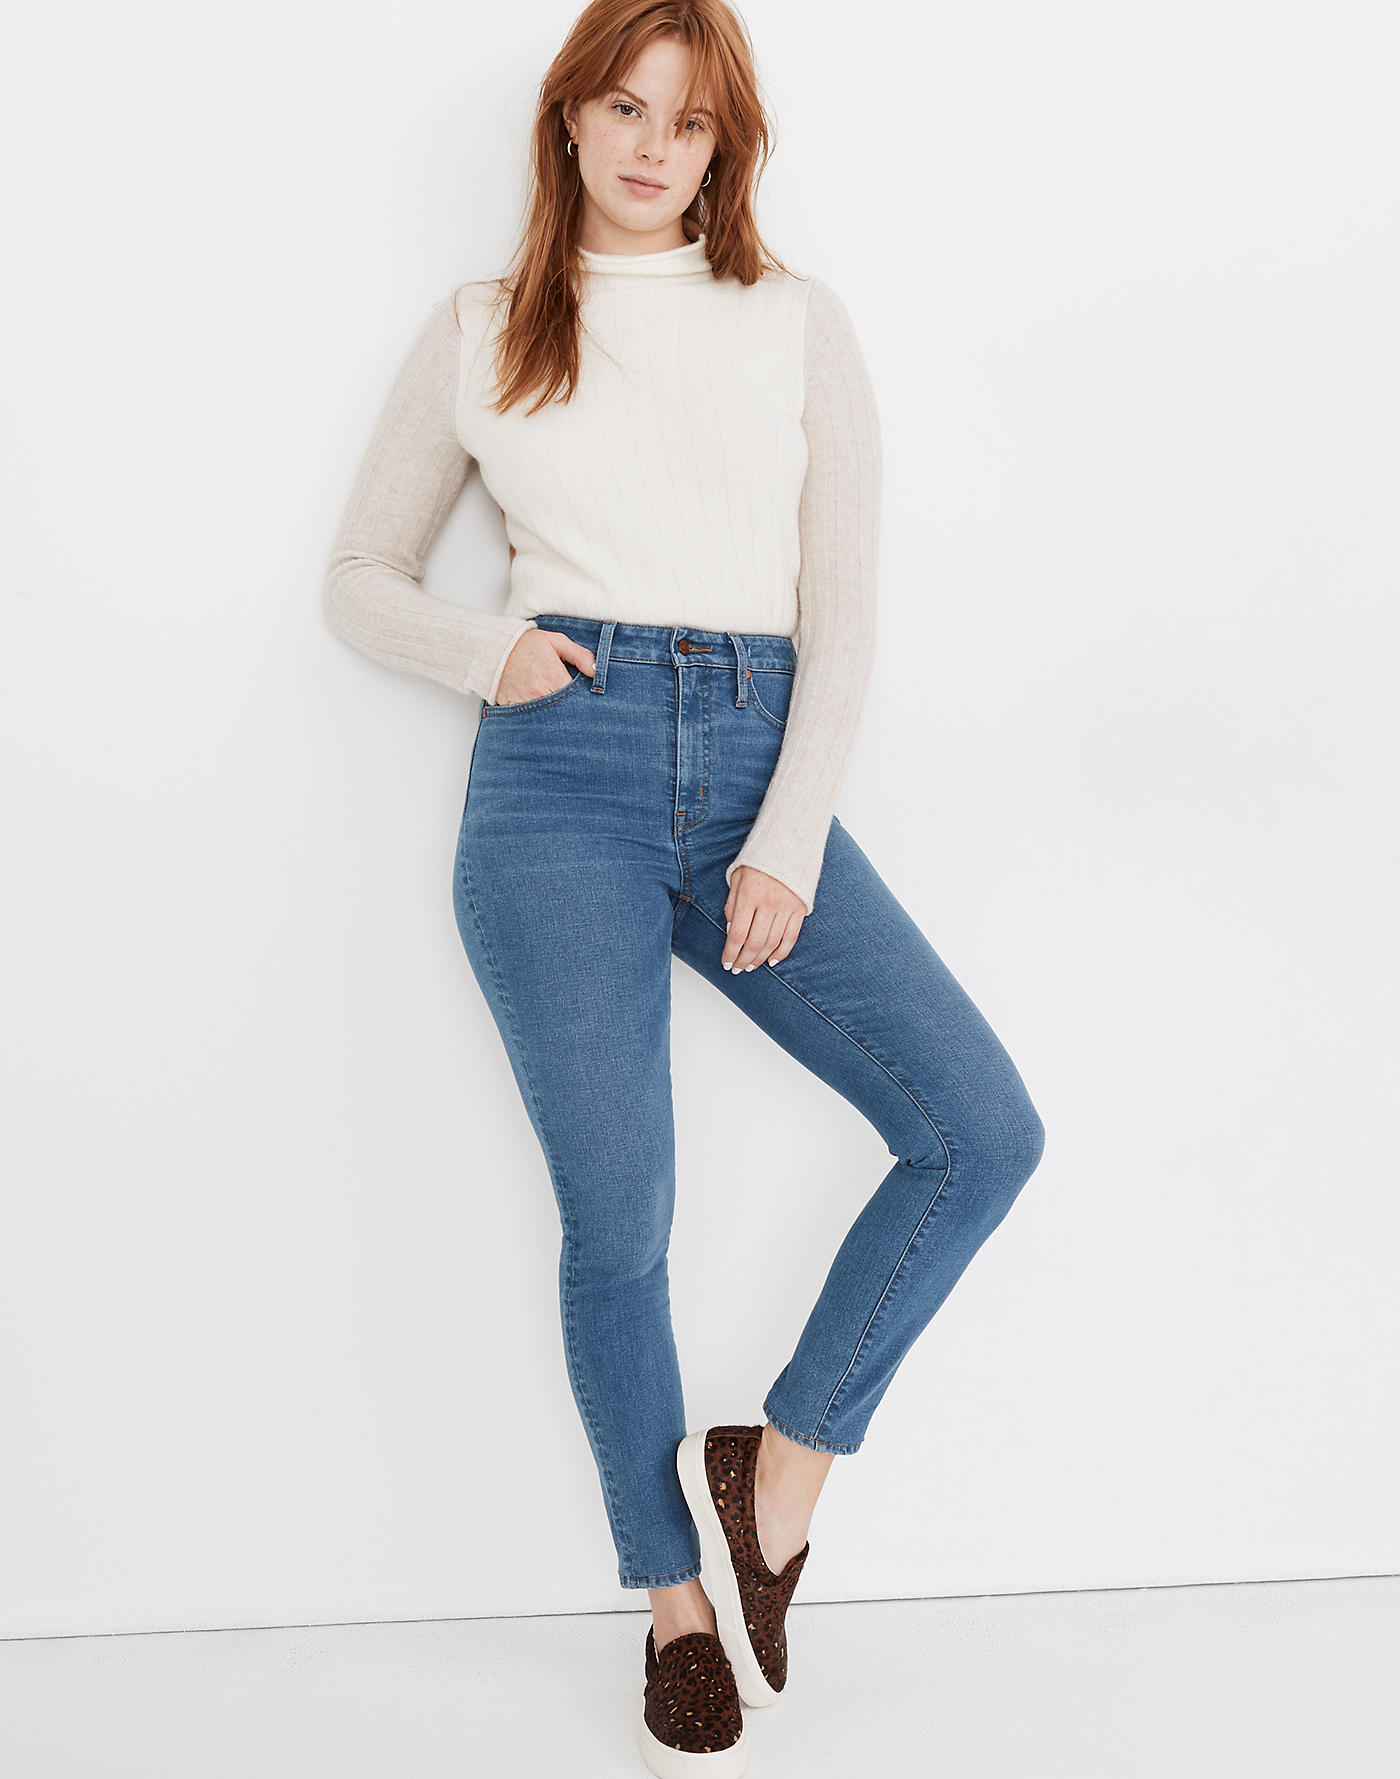 Madewell Curvy High-Rise Skinny Jeans in Astoria Wash: TENCEL Denim Edition